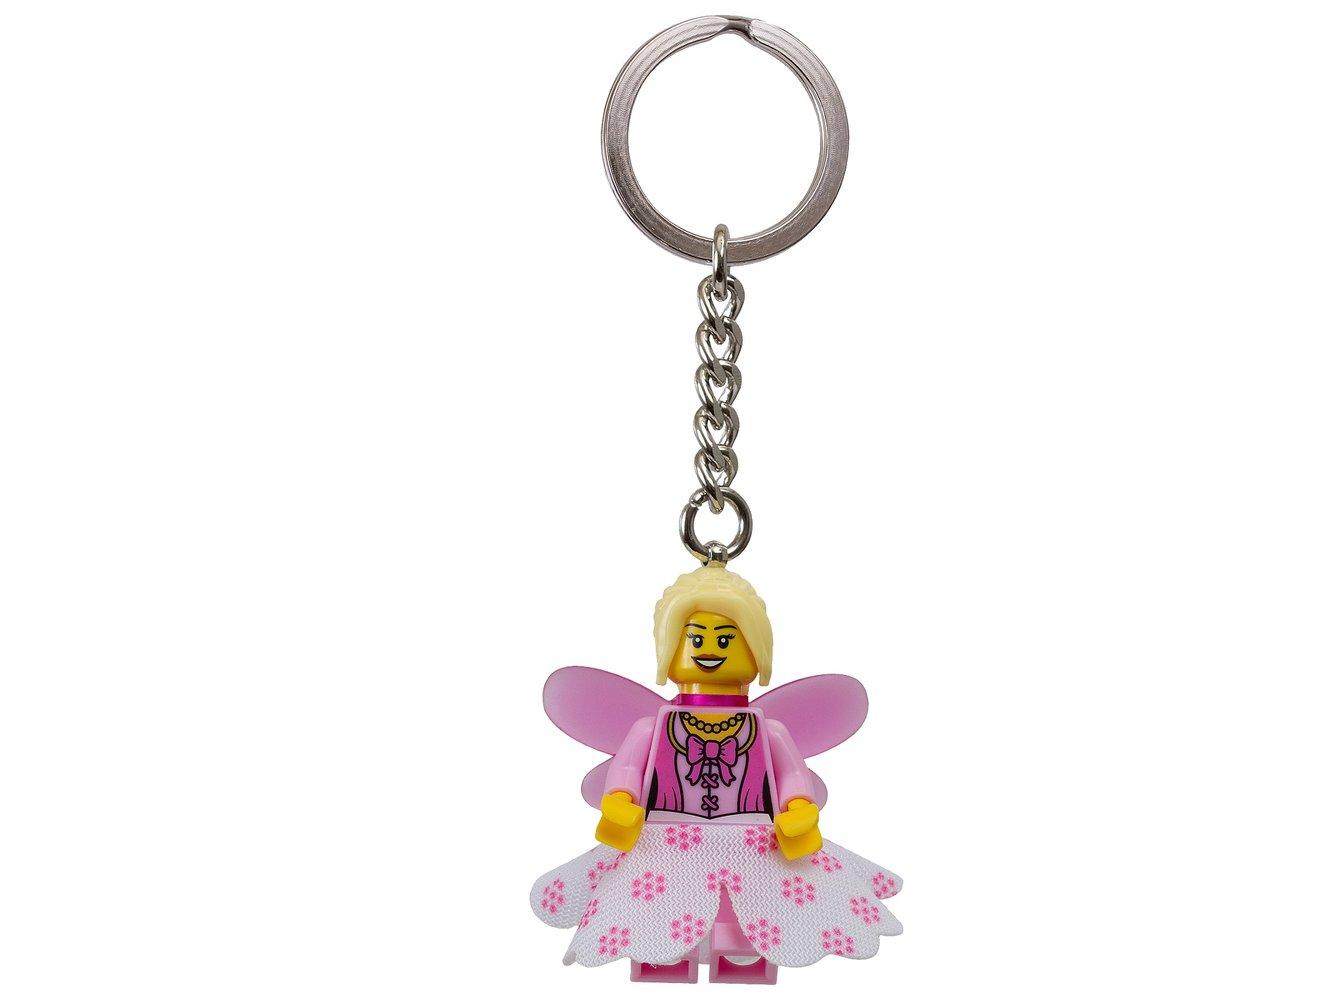 Girl Minifigure Key Chain